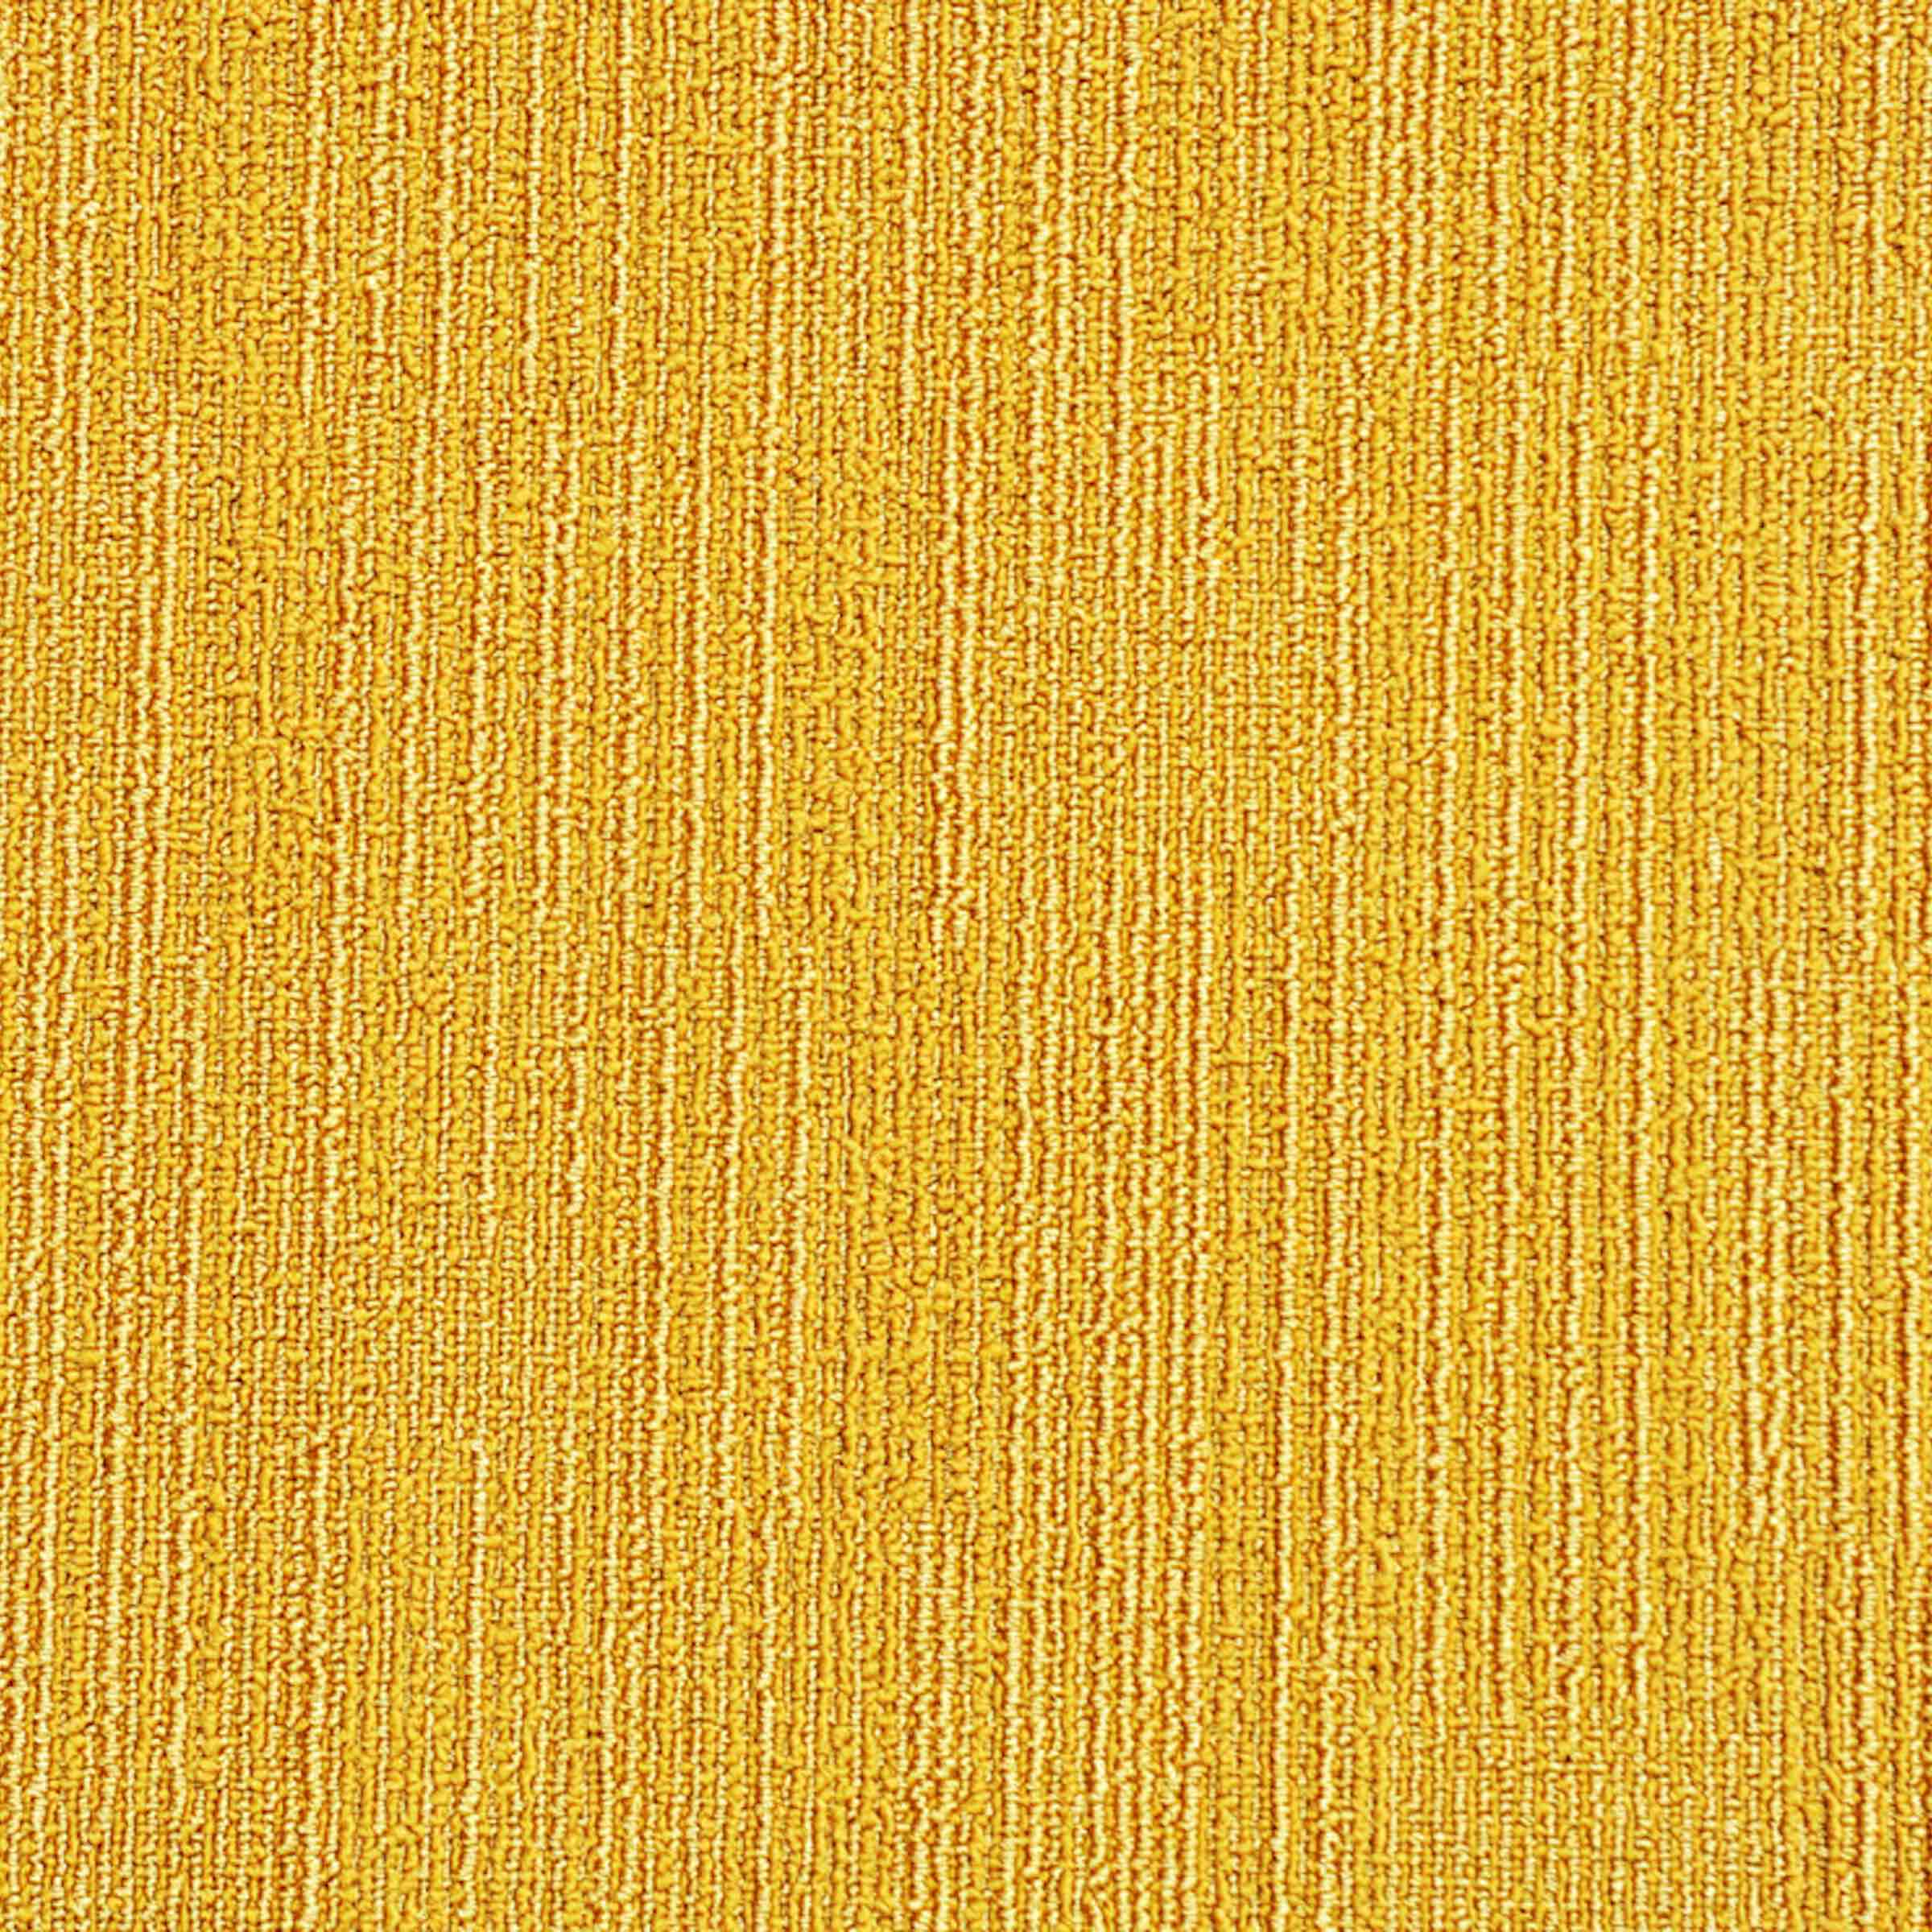 Highlights 3 Multi-Level   42413   Paragon Carpet Tiles   Commercial Carpet Tiles